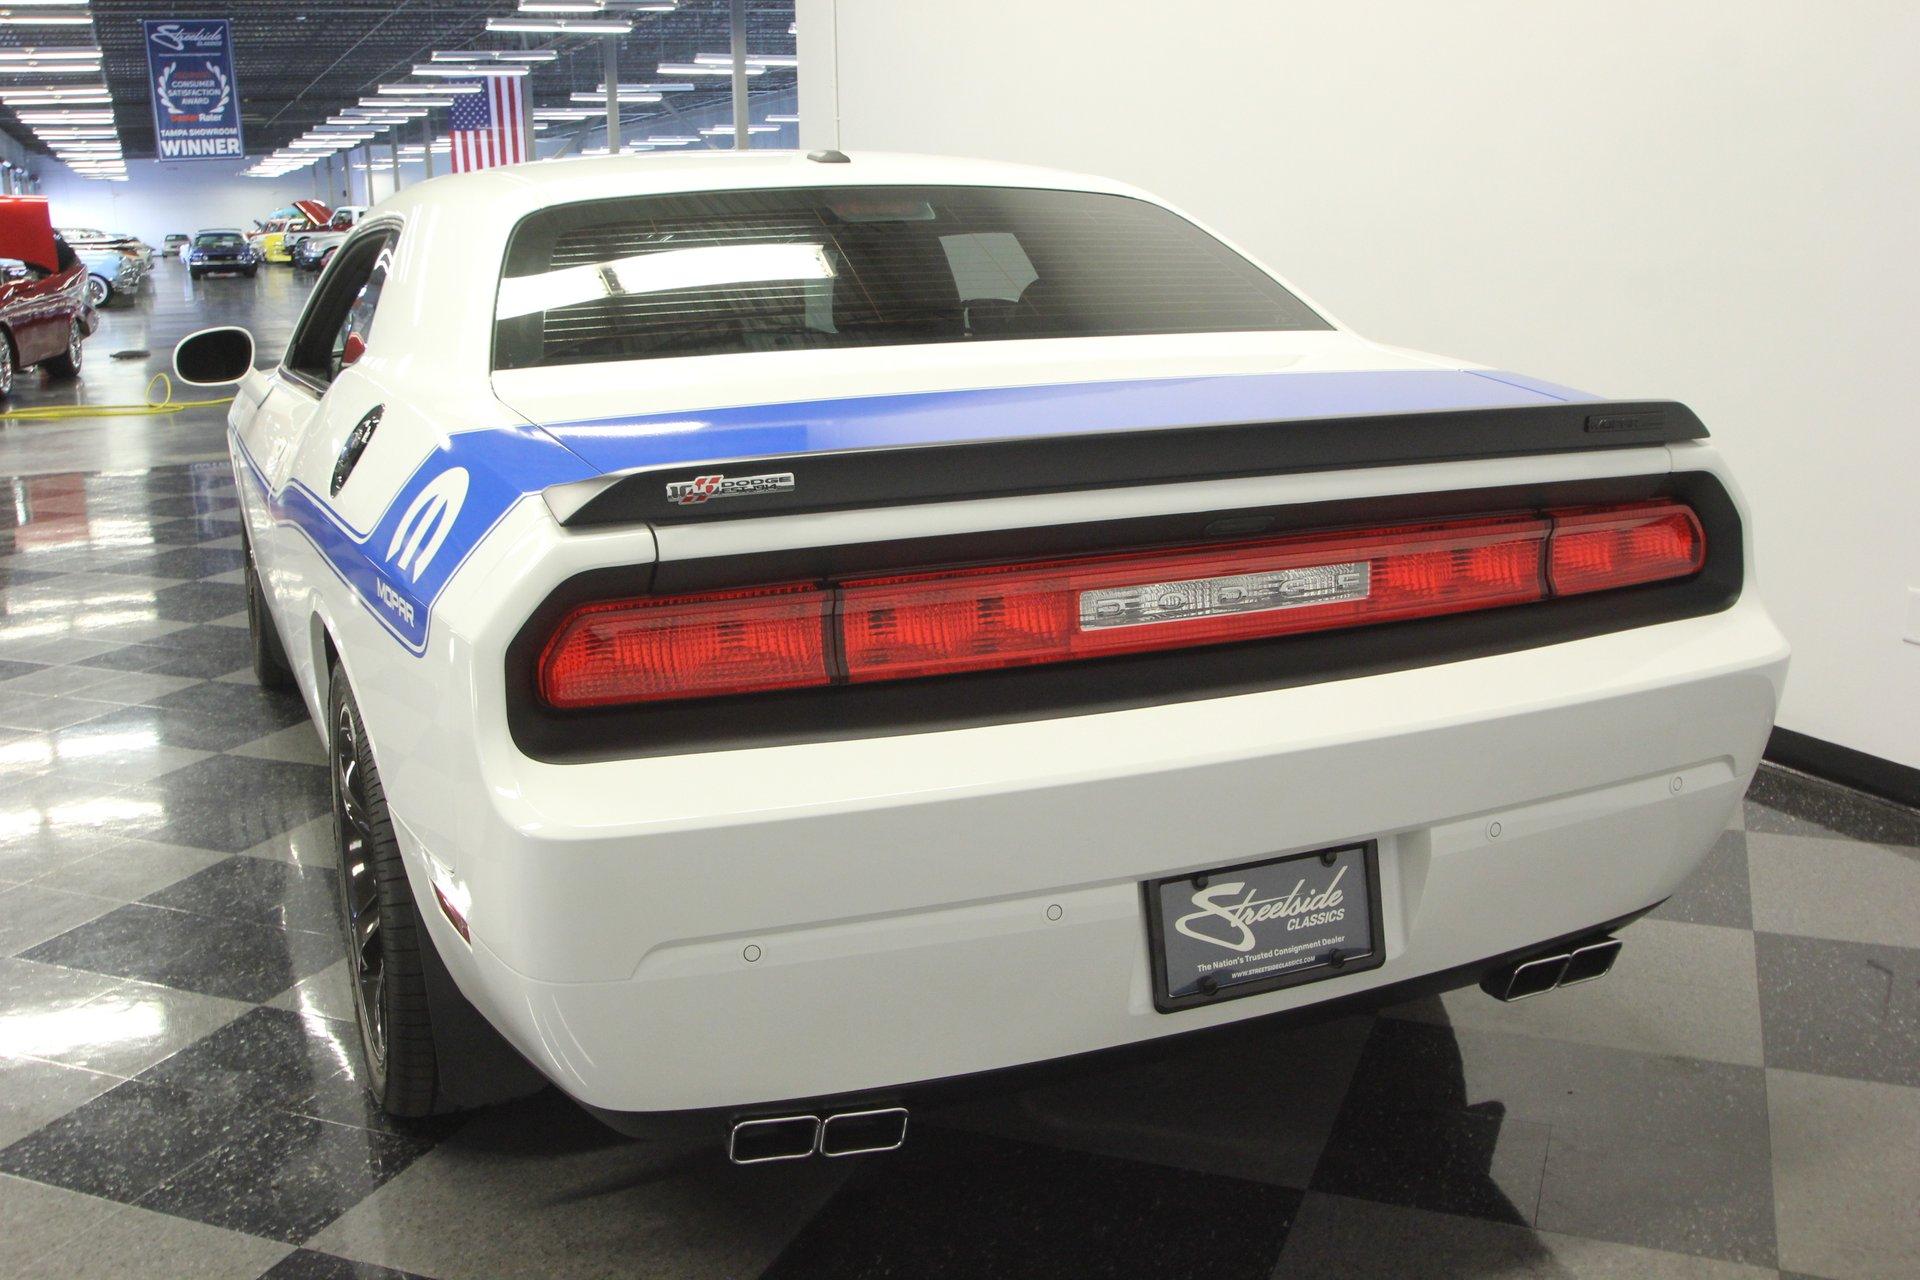 2014 Dodge Challenger Mopar '14 Edition for sale #119192 | MCG